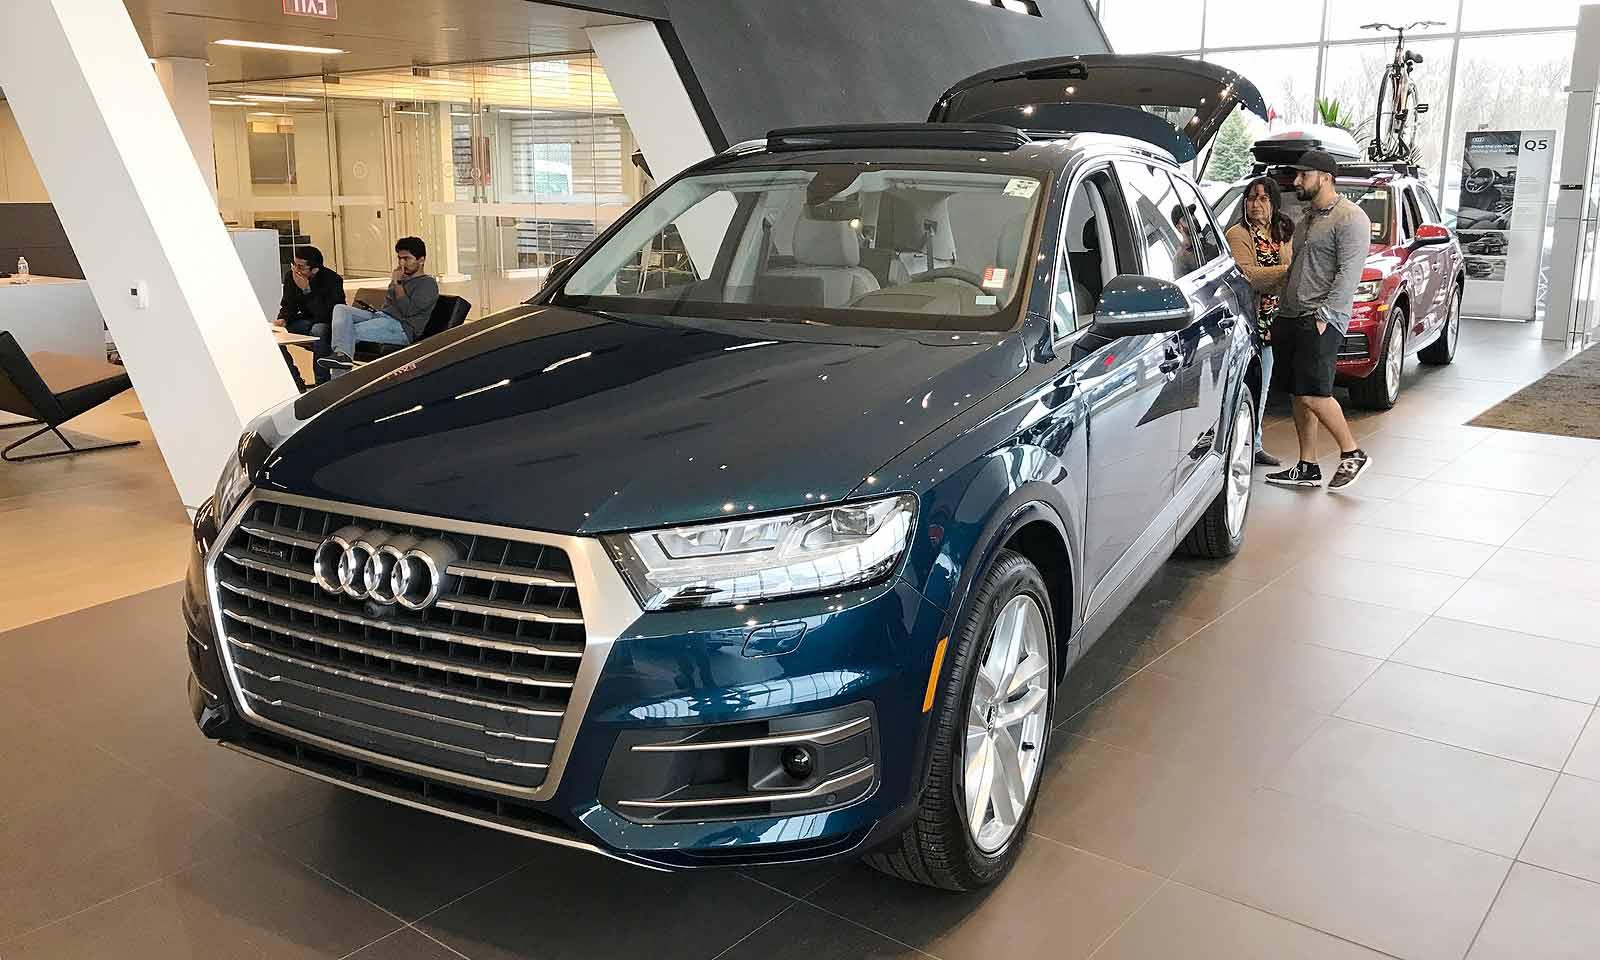 Volkswagen Vw Brand Advances 4 5 Audi 2 1 On Crossovers